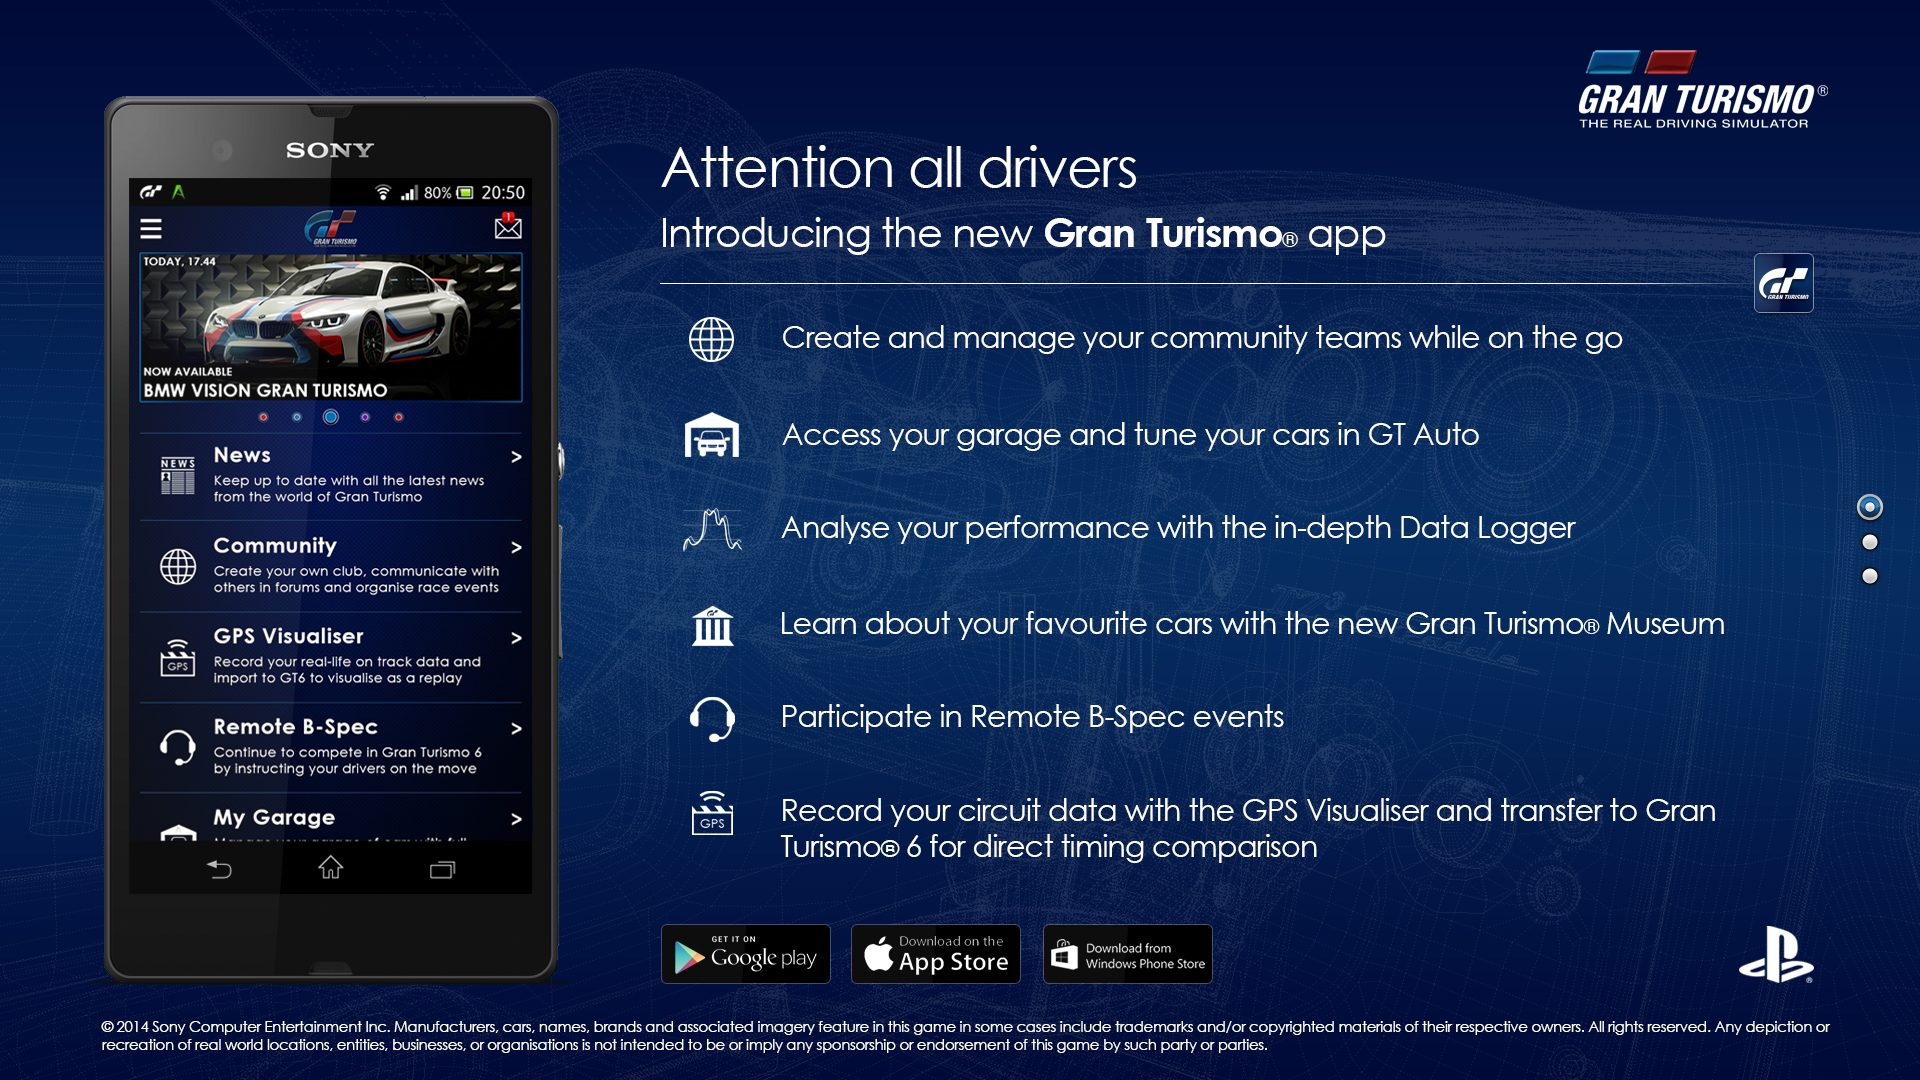 Gran Turismo App Advertisment HD1080.jpg